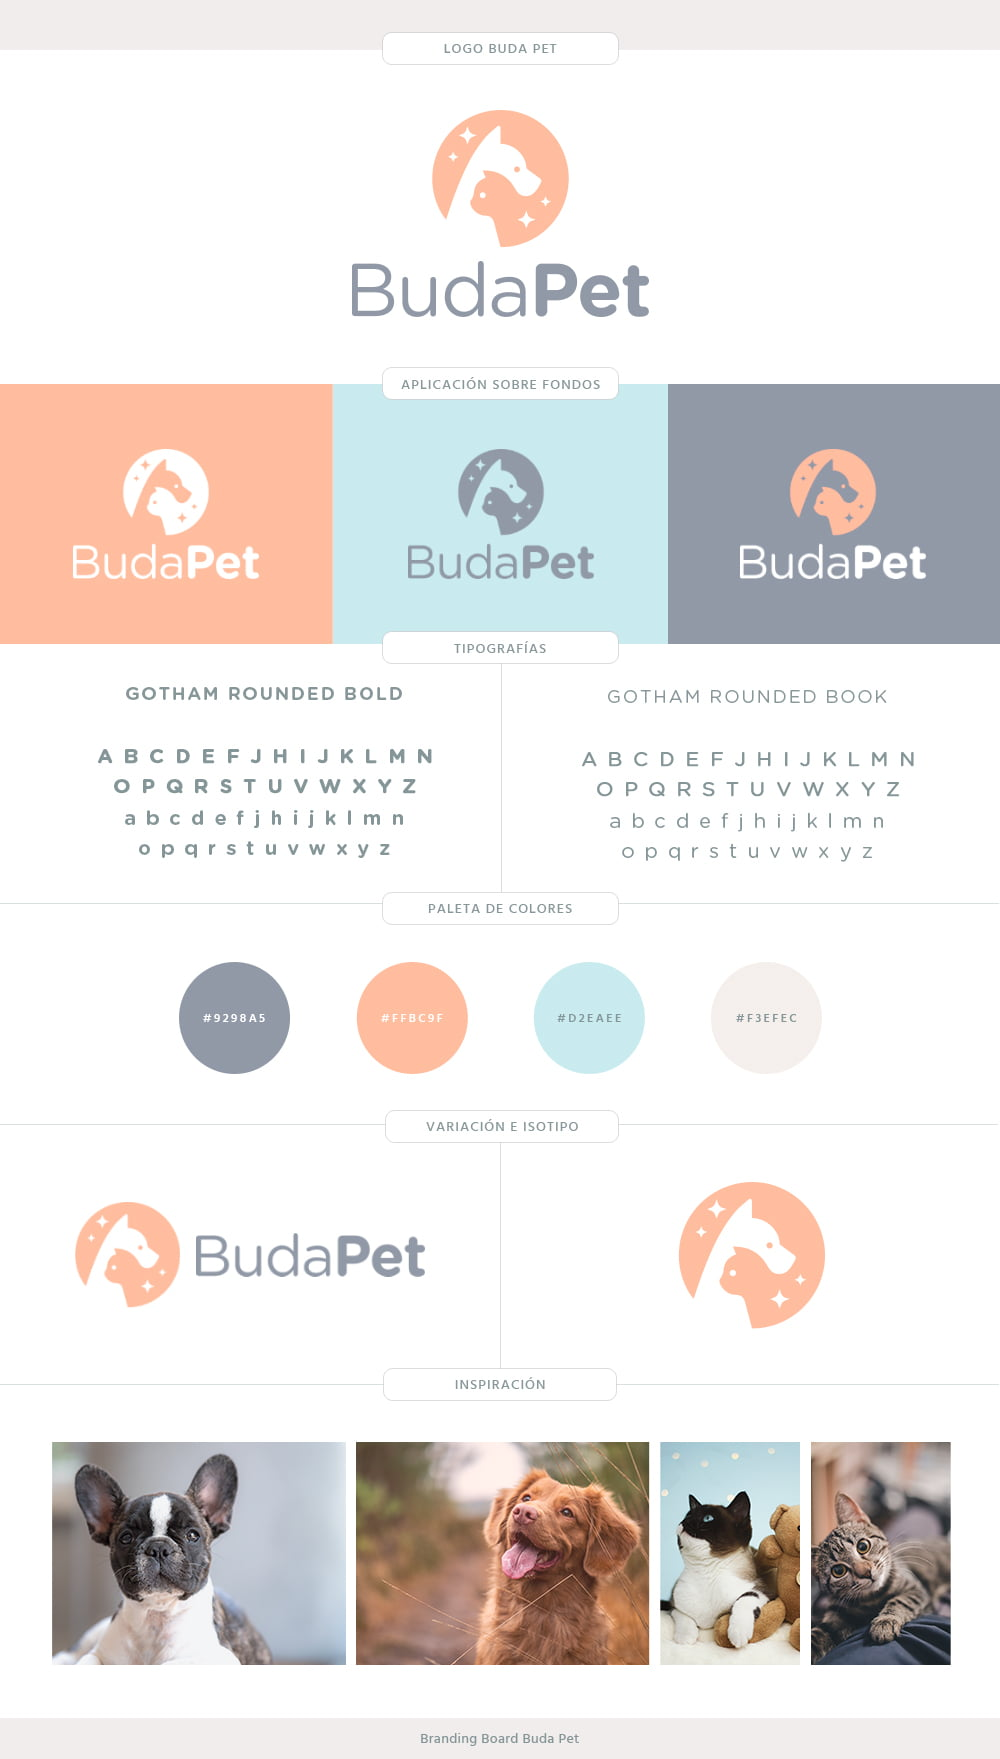 logo completo budapet - Buda Pet